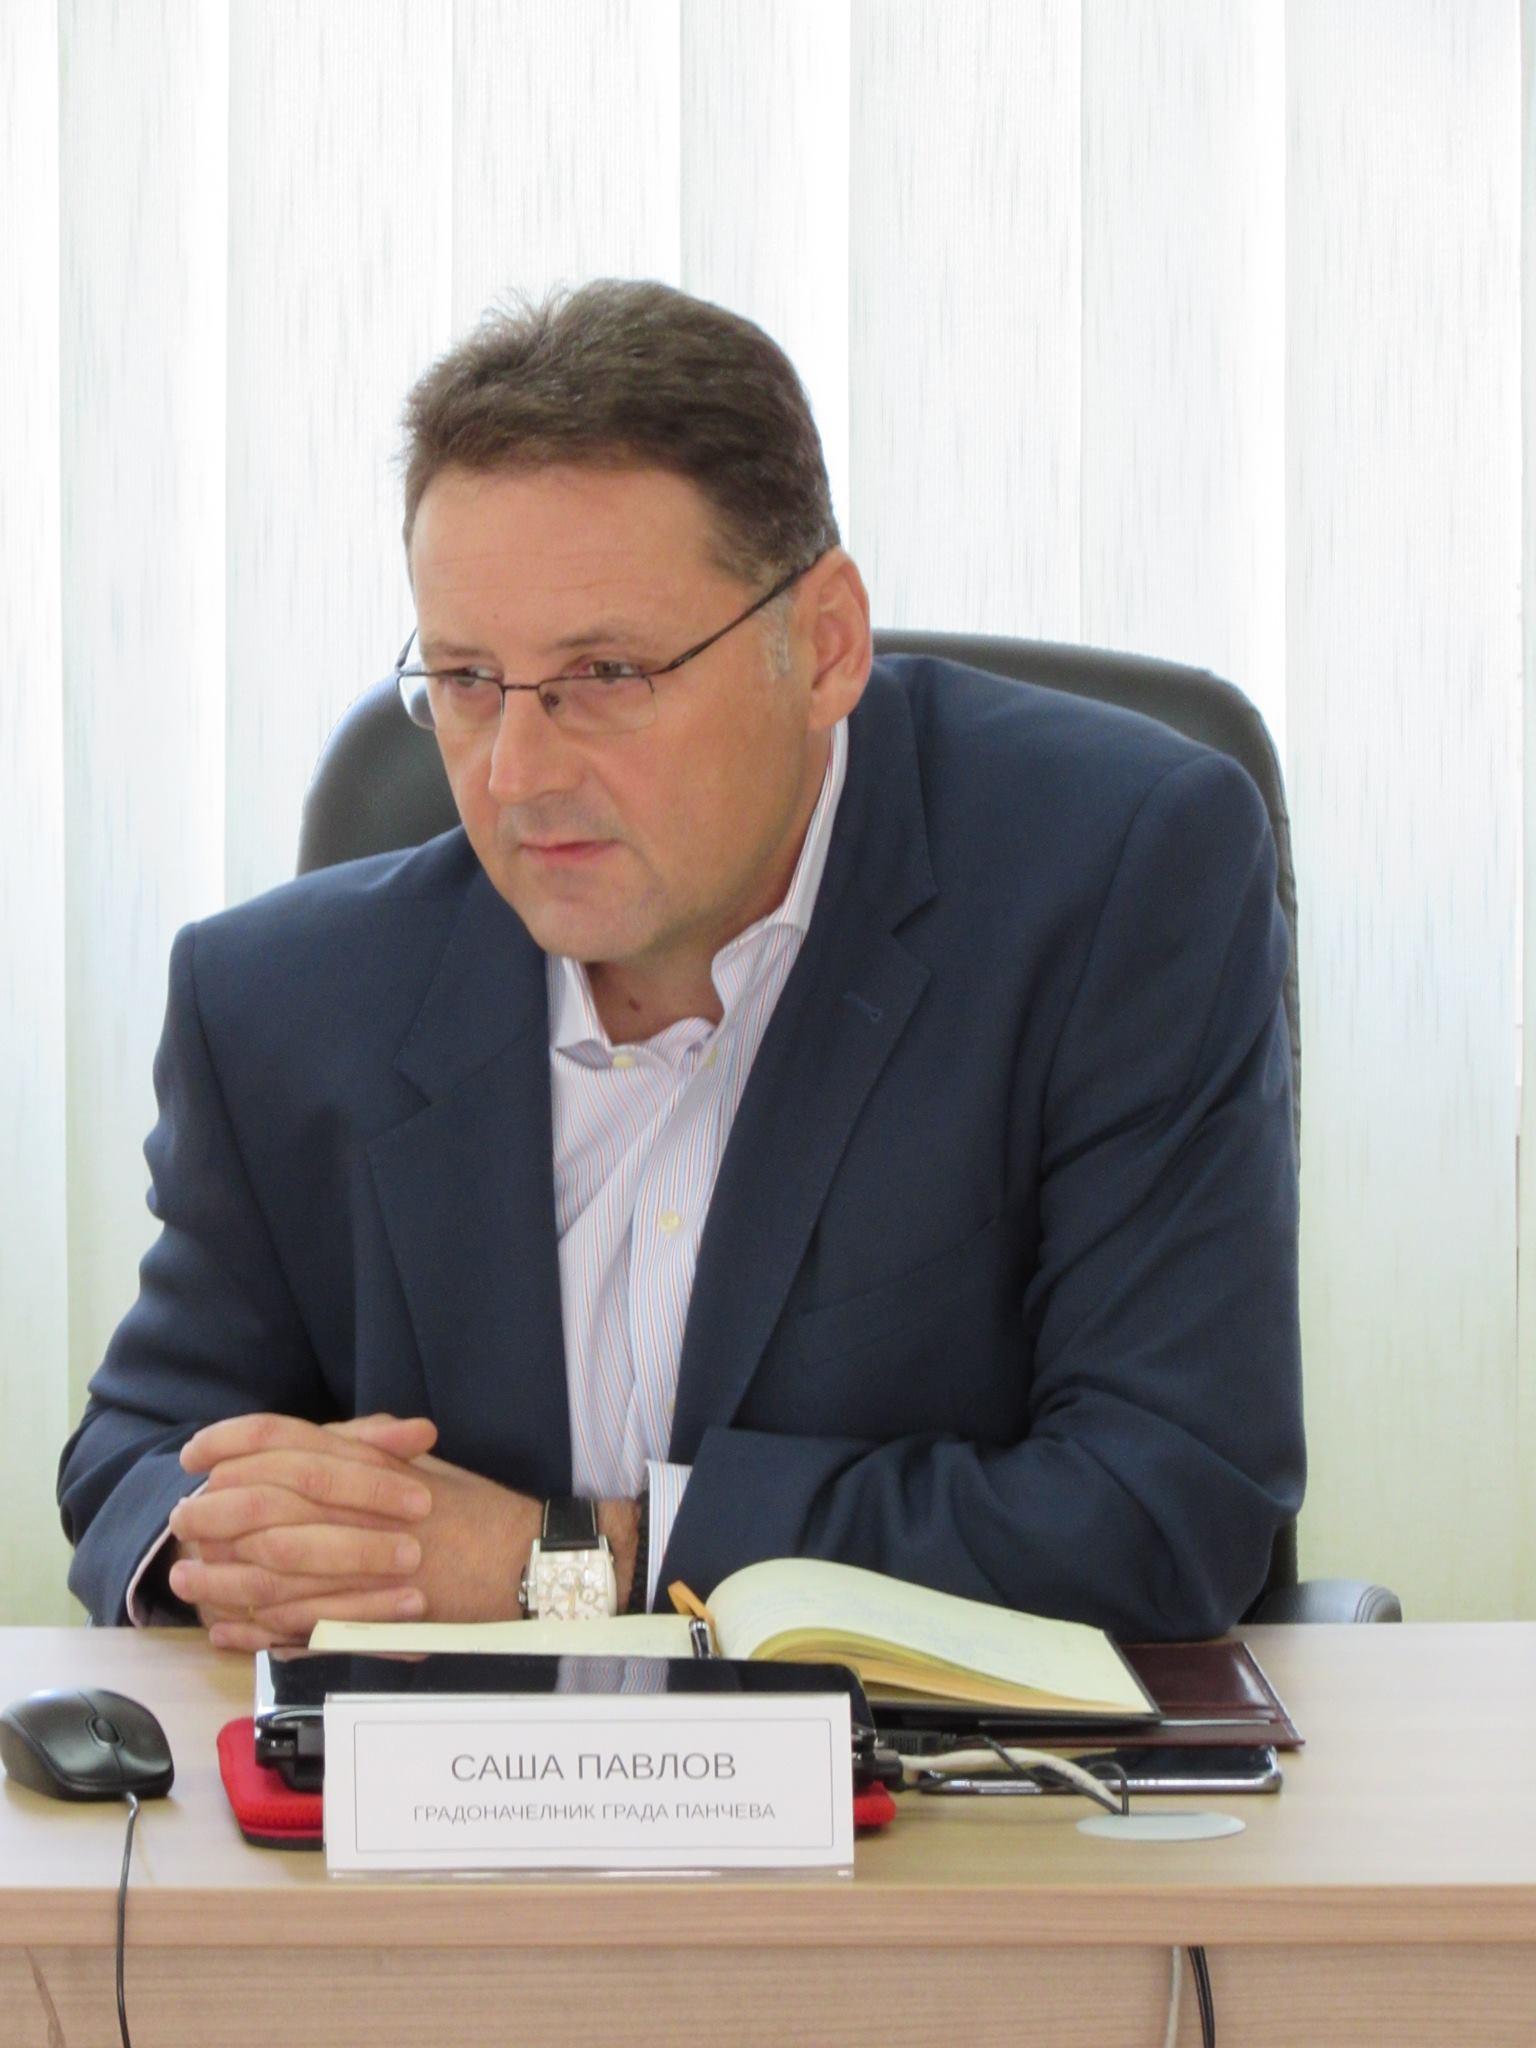 Saša Pavlov